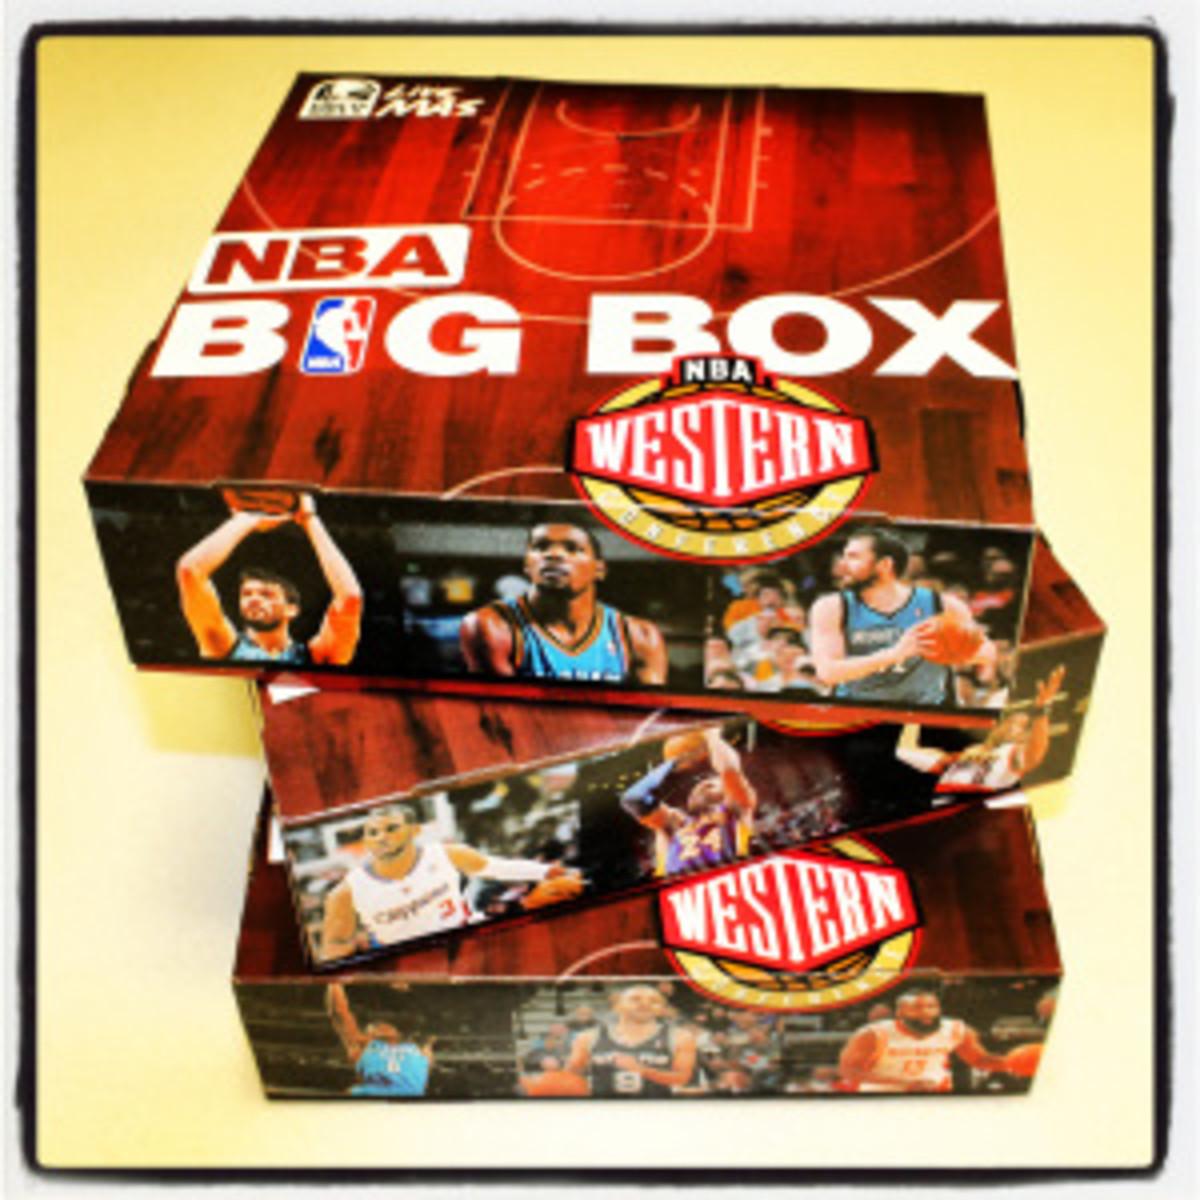 BIG Box Western Conference (1)